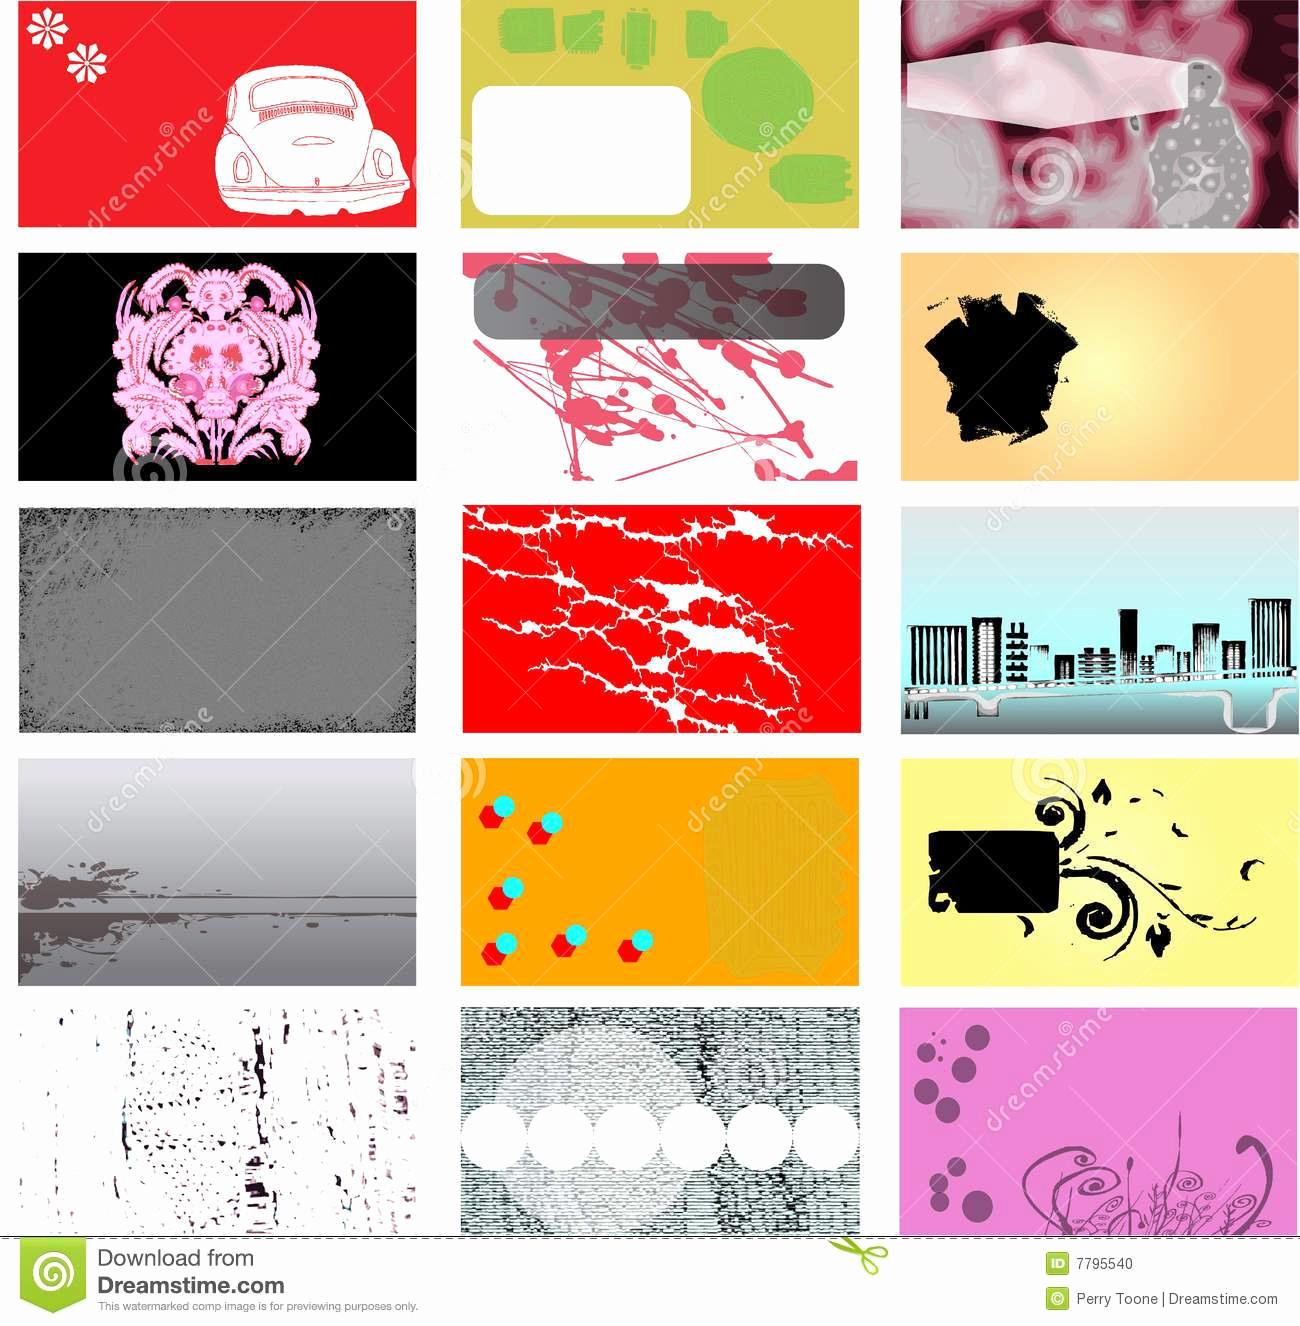 Cool Debit Card Designs Beautiful Cool Debit Card Designs